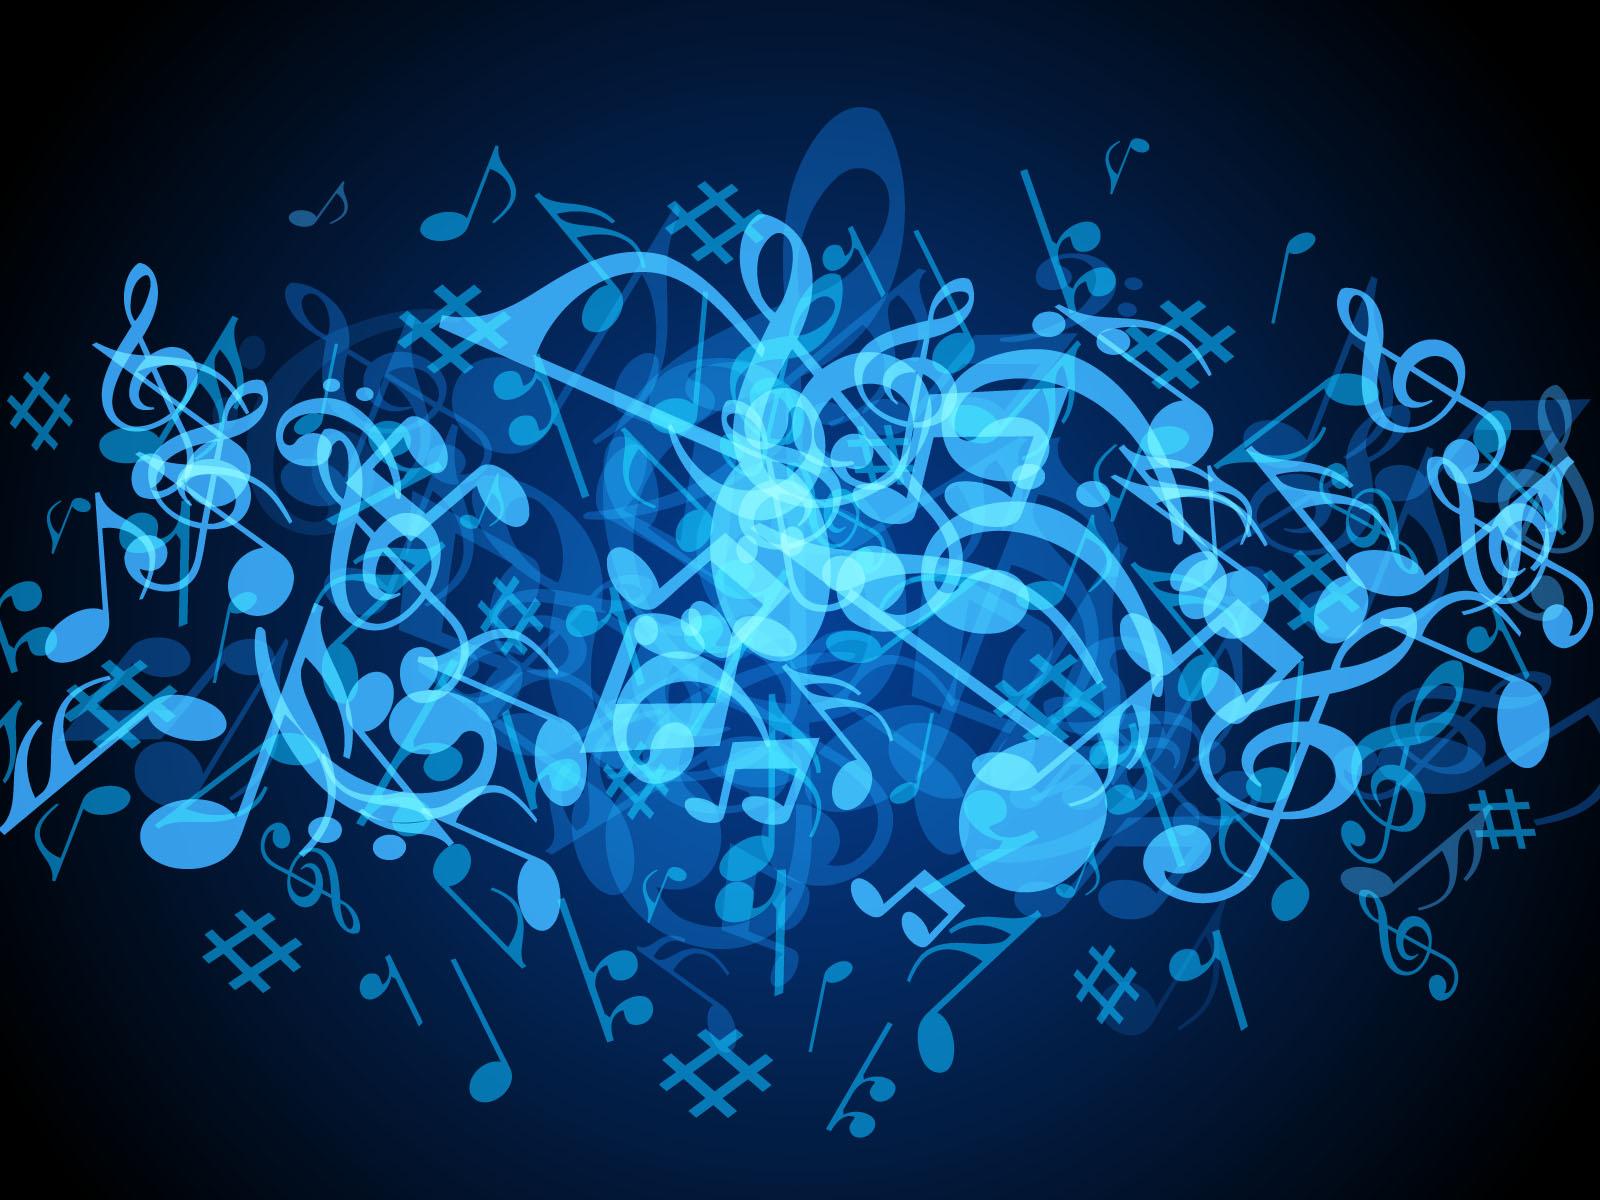 Wallpaper Music Notes 1600x1200